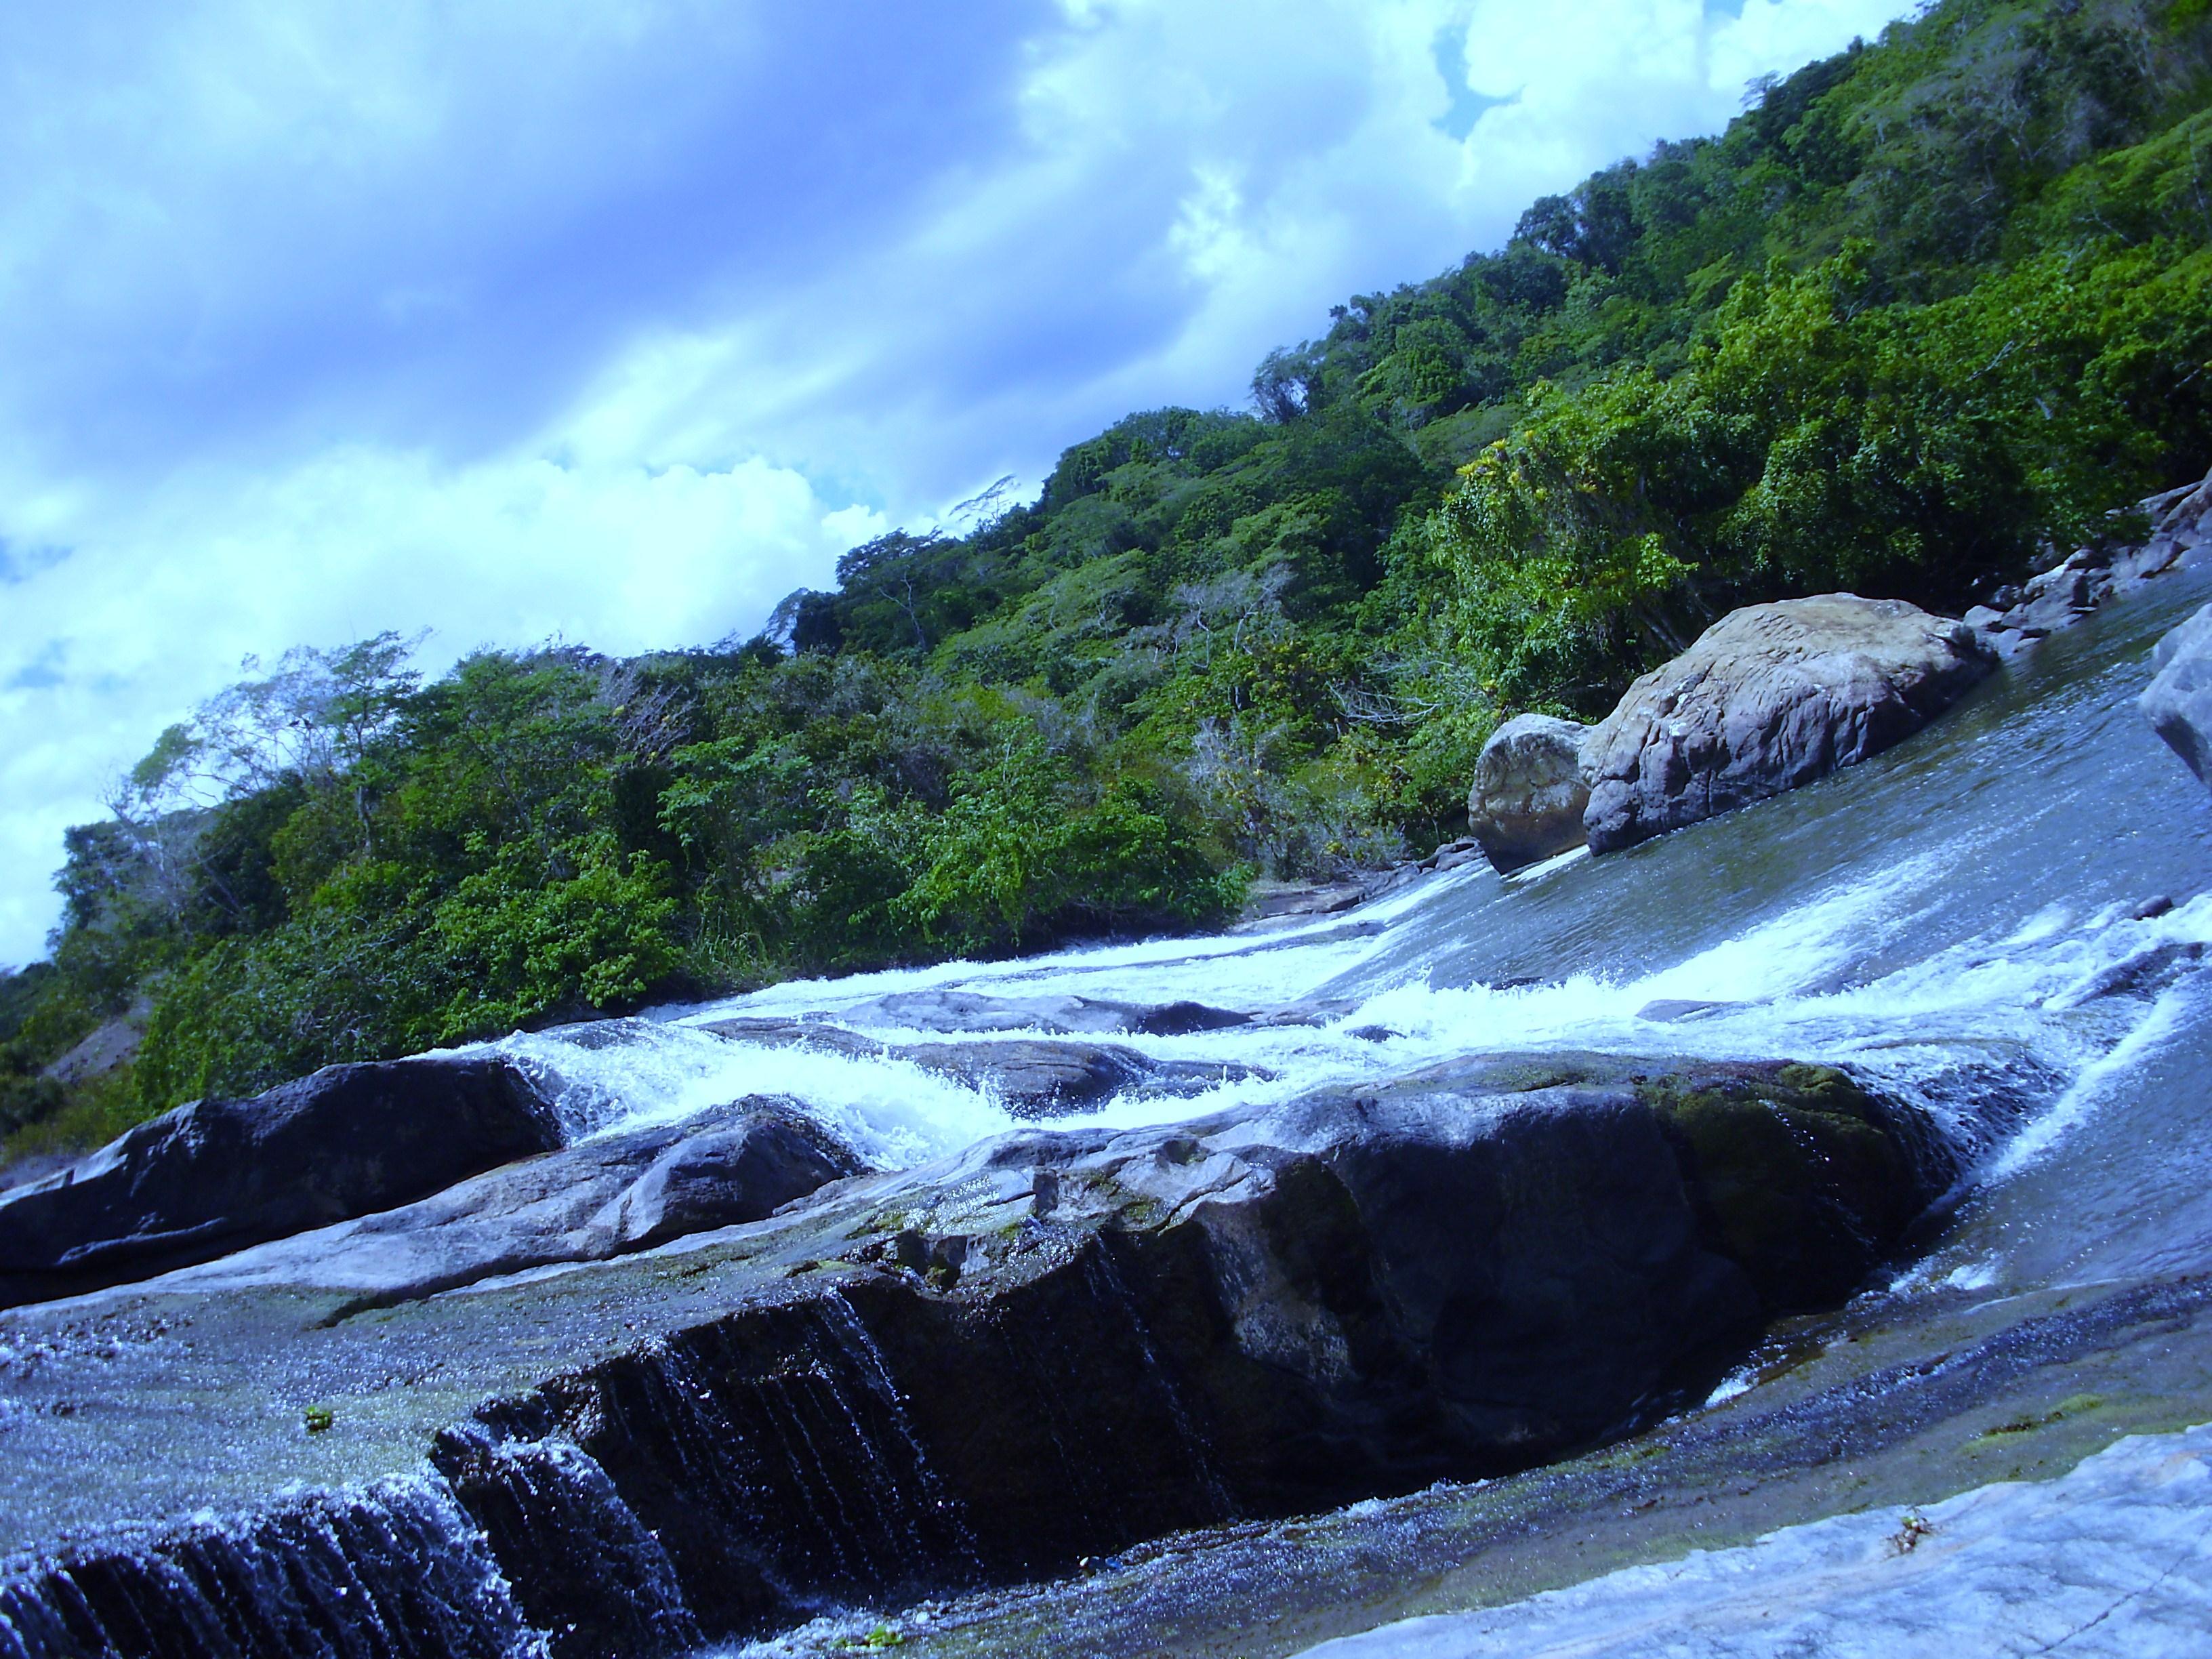 Guaratinga Bahia fonte: upload.wikimedia.org